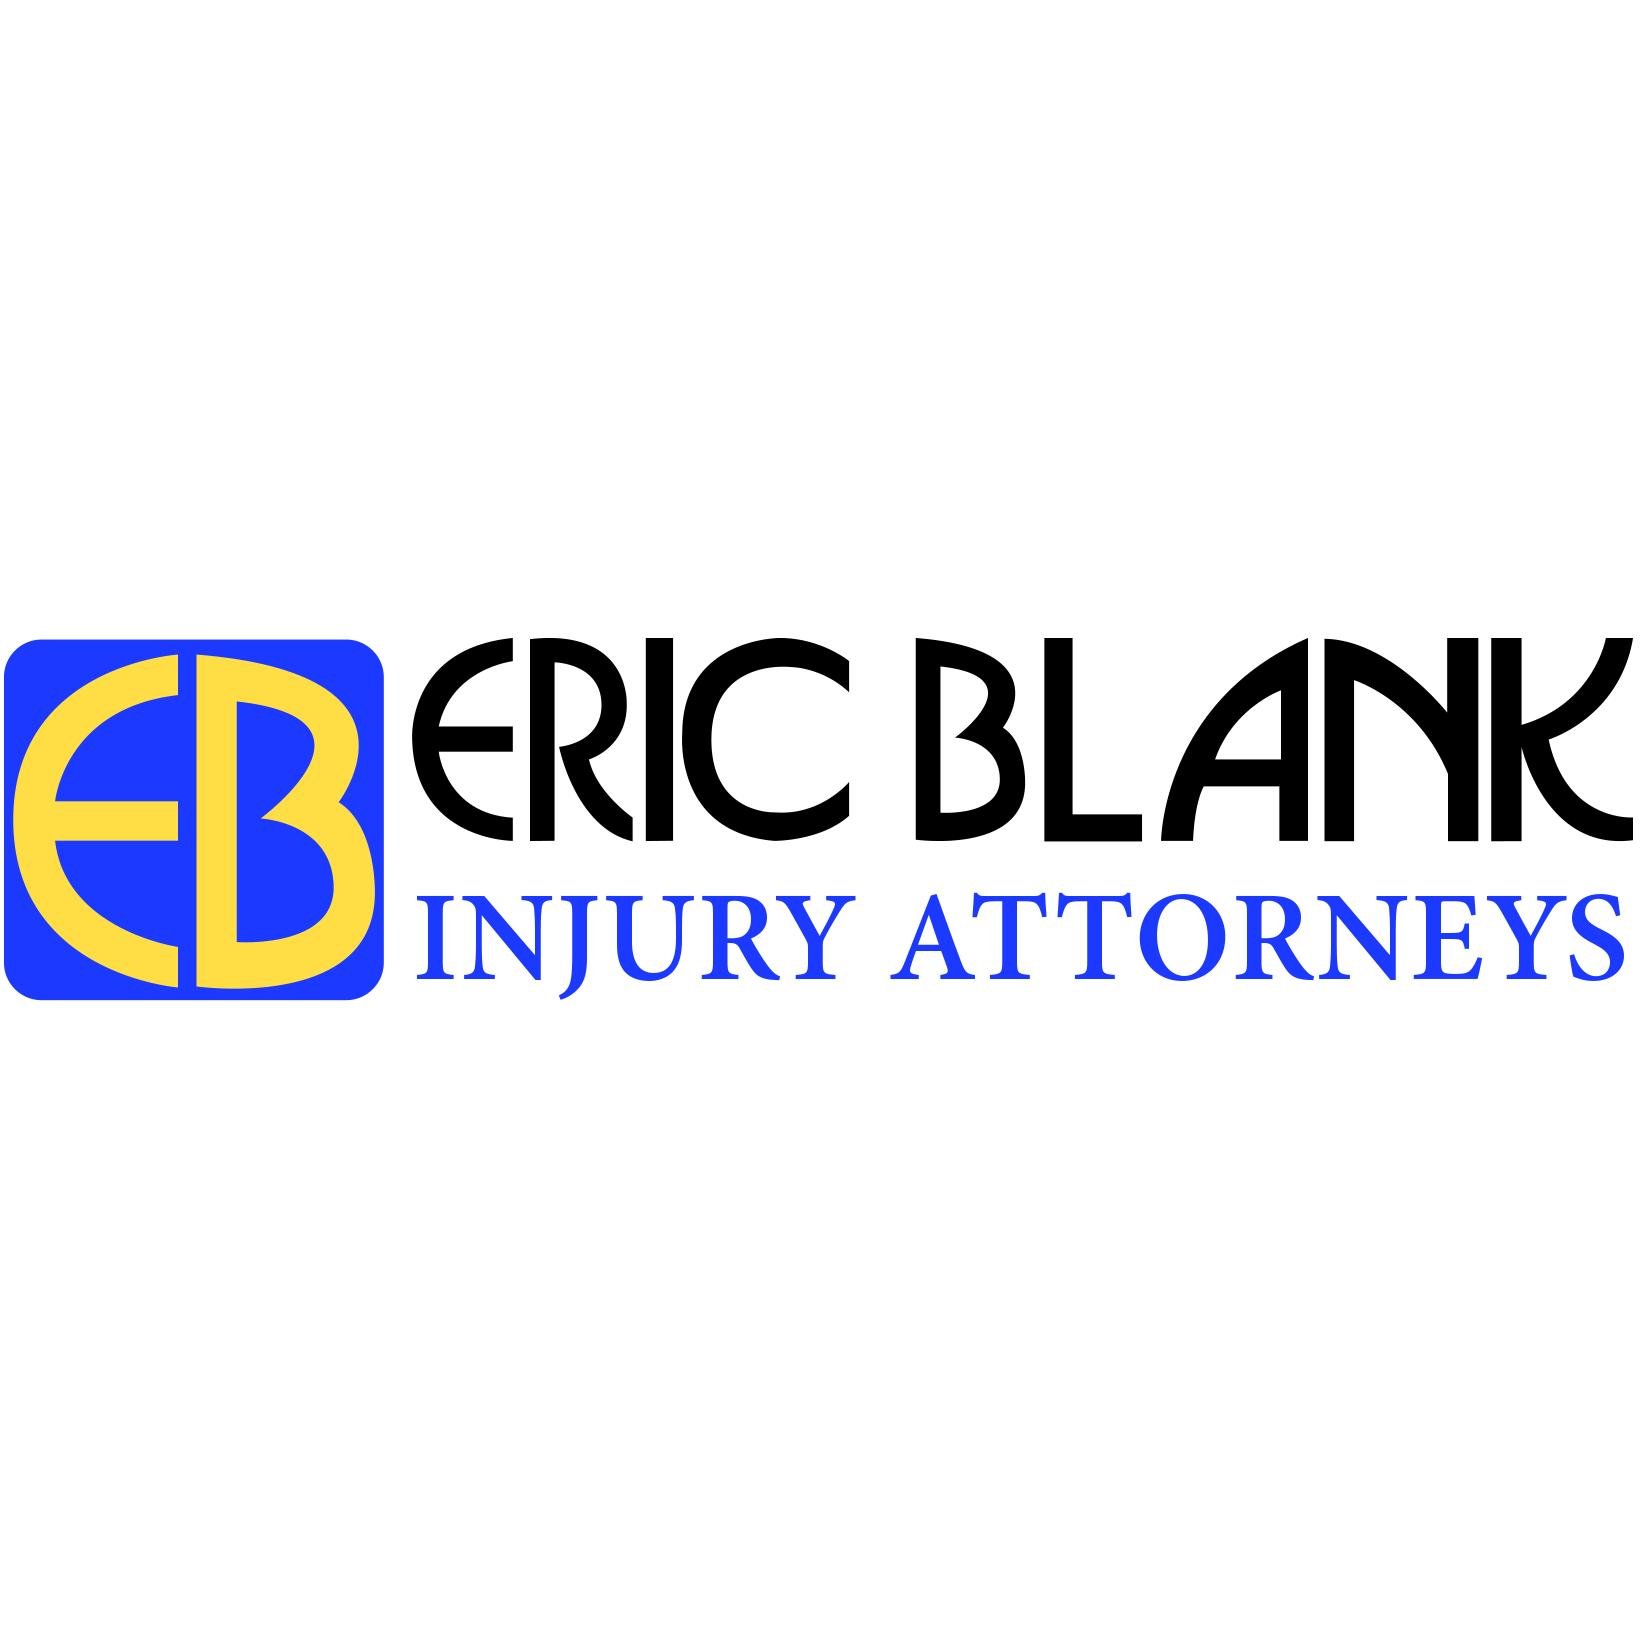 Eric Blank Injury Attorneys image 6